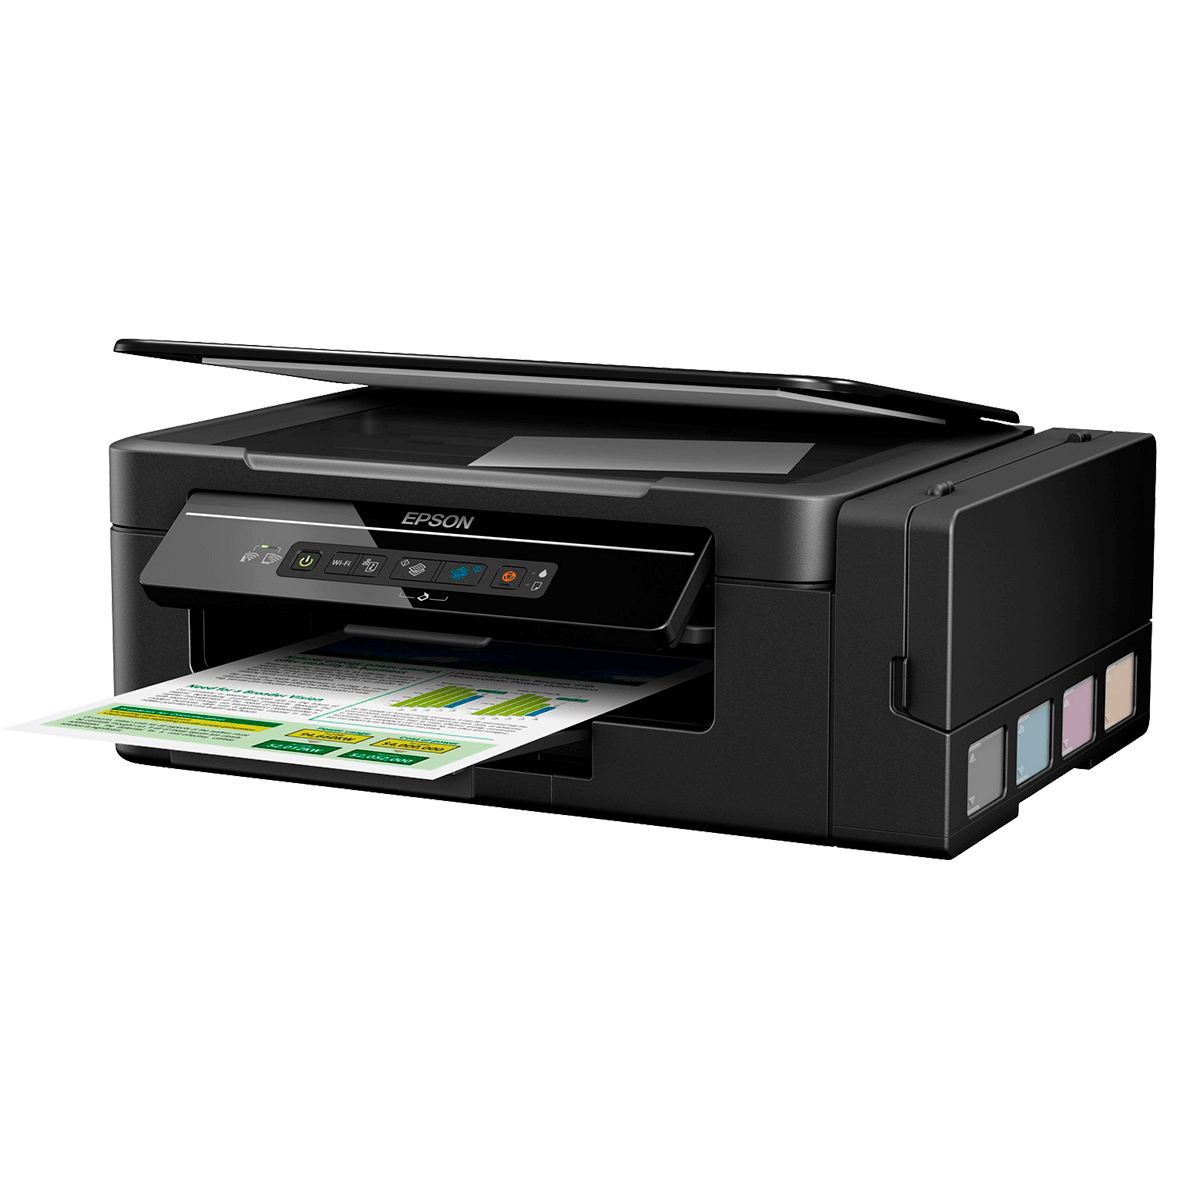 Impressora Epson Multifuncional 3 em 1: imprime, copia e digitaliza.